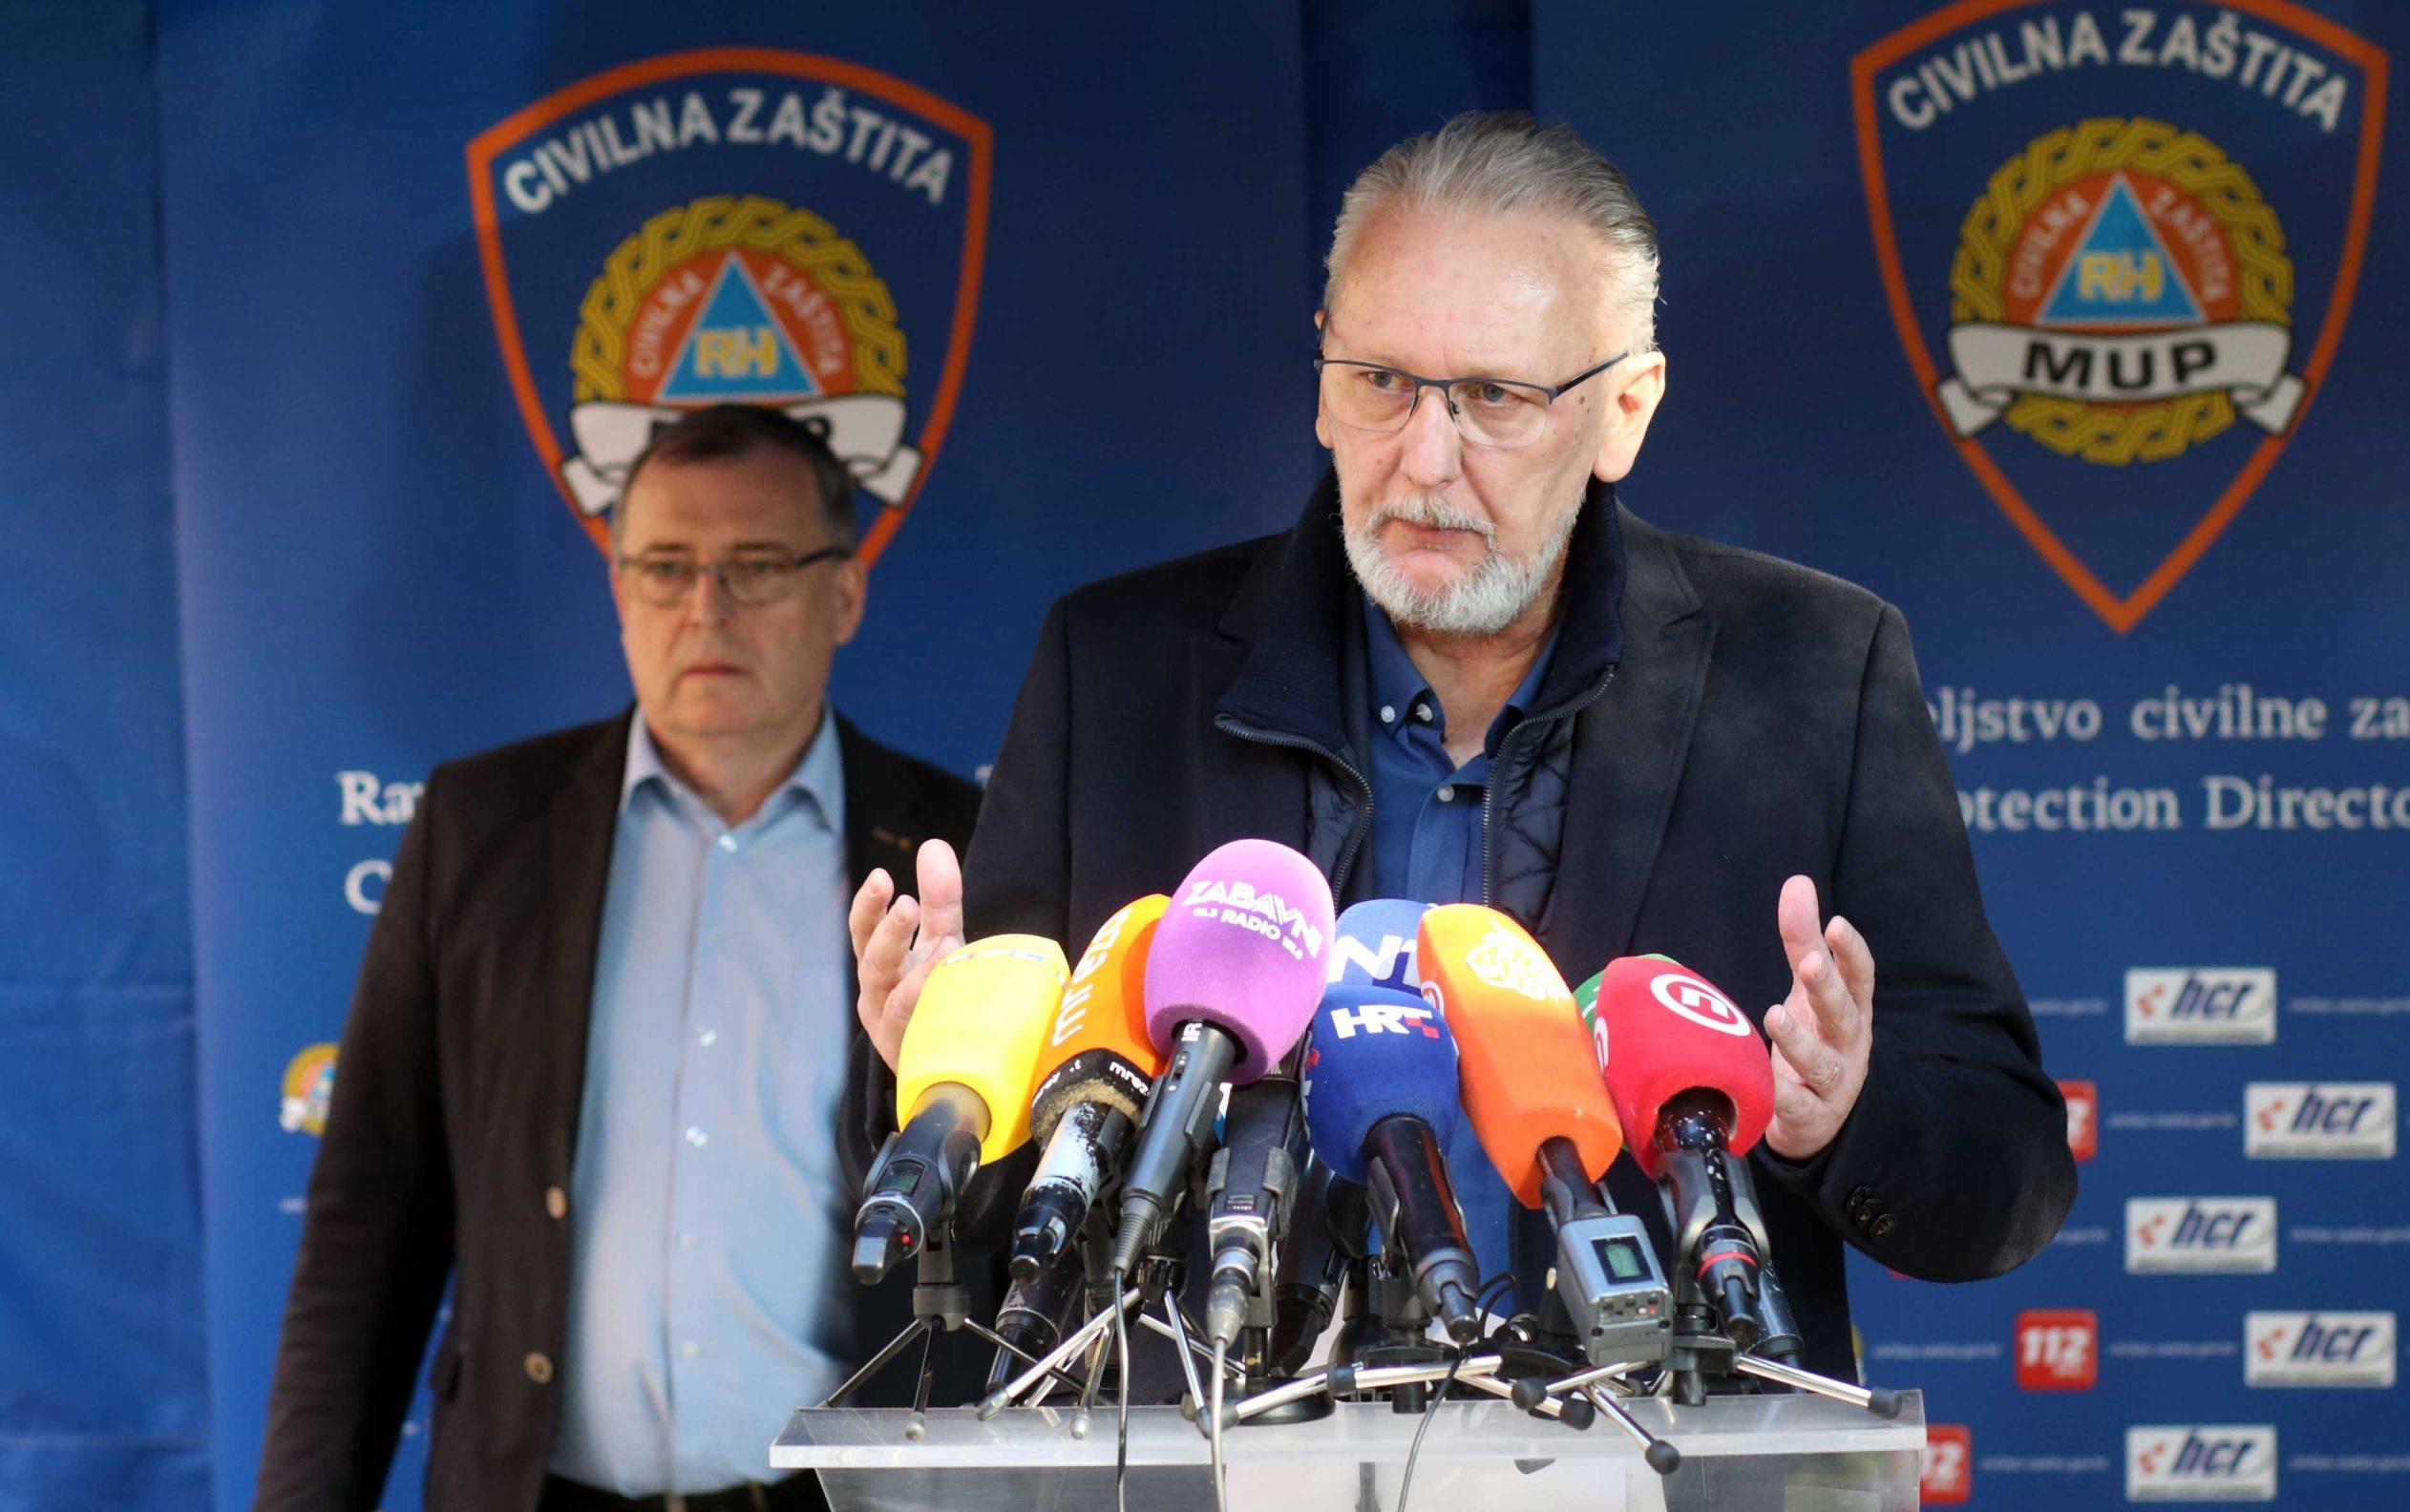 Minister of the Interior Davor Bozinovic